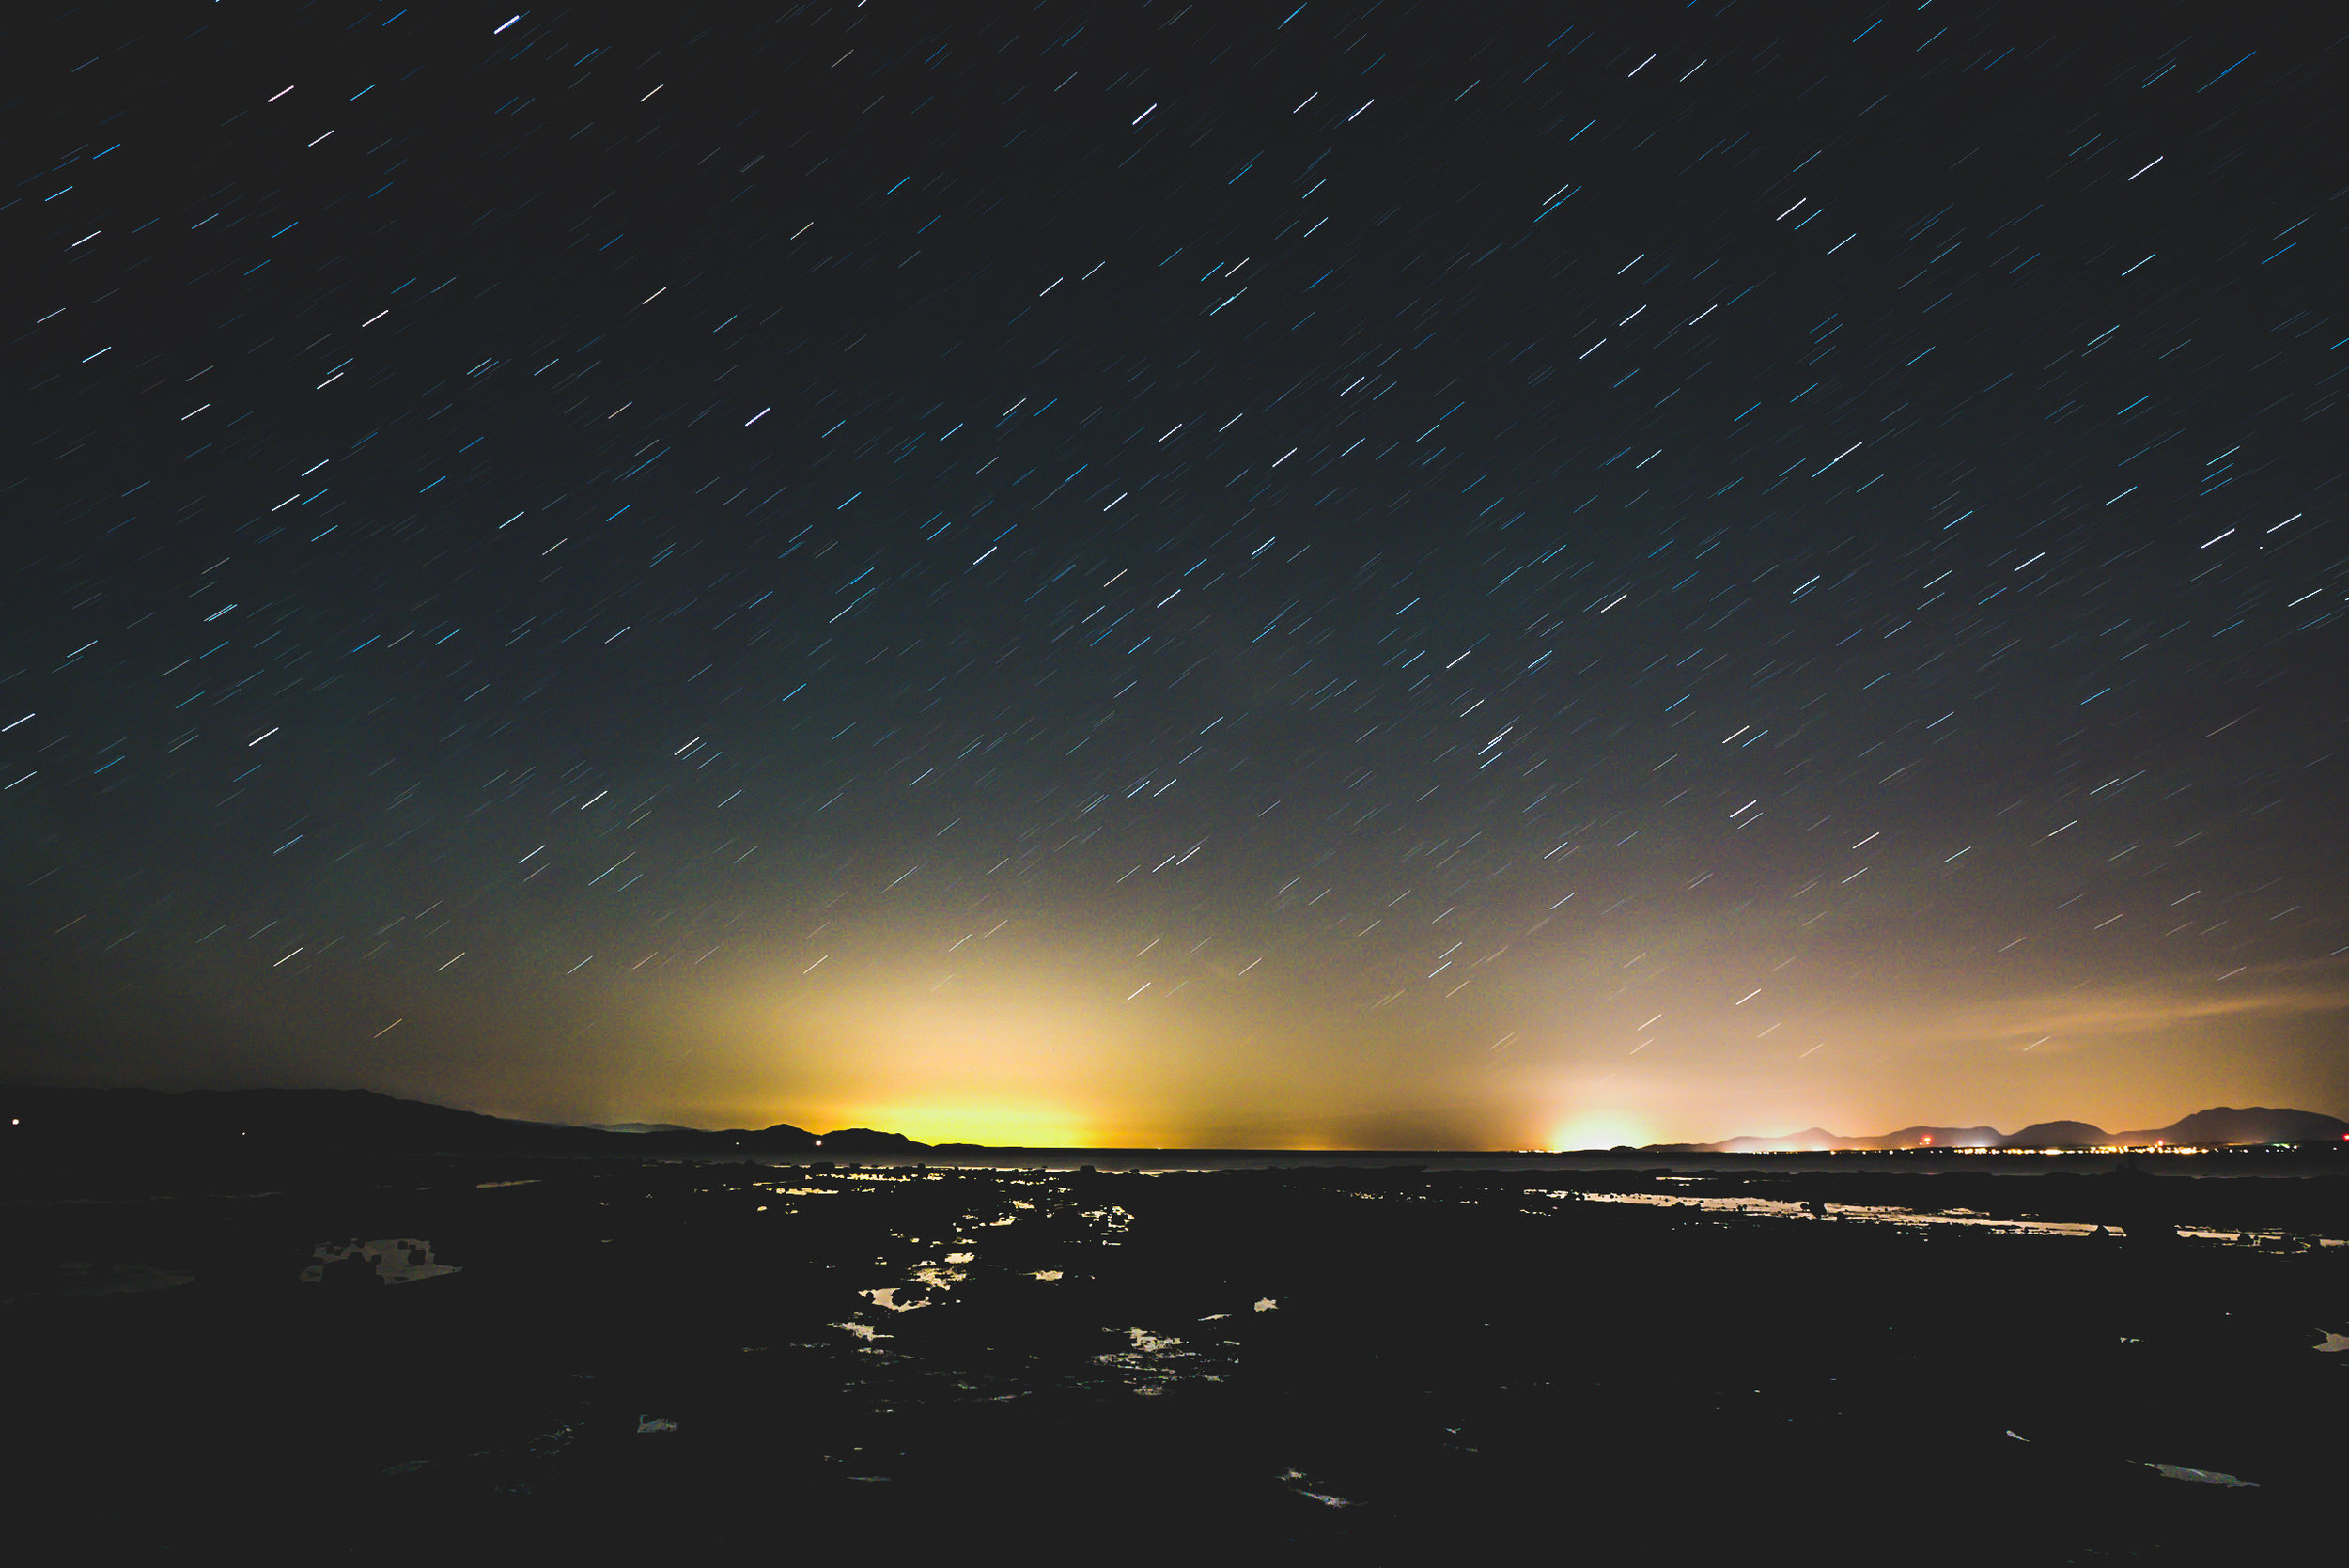 Lightspeed of the Sandpiper